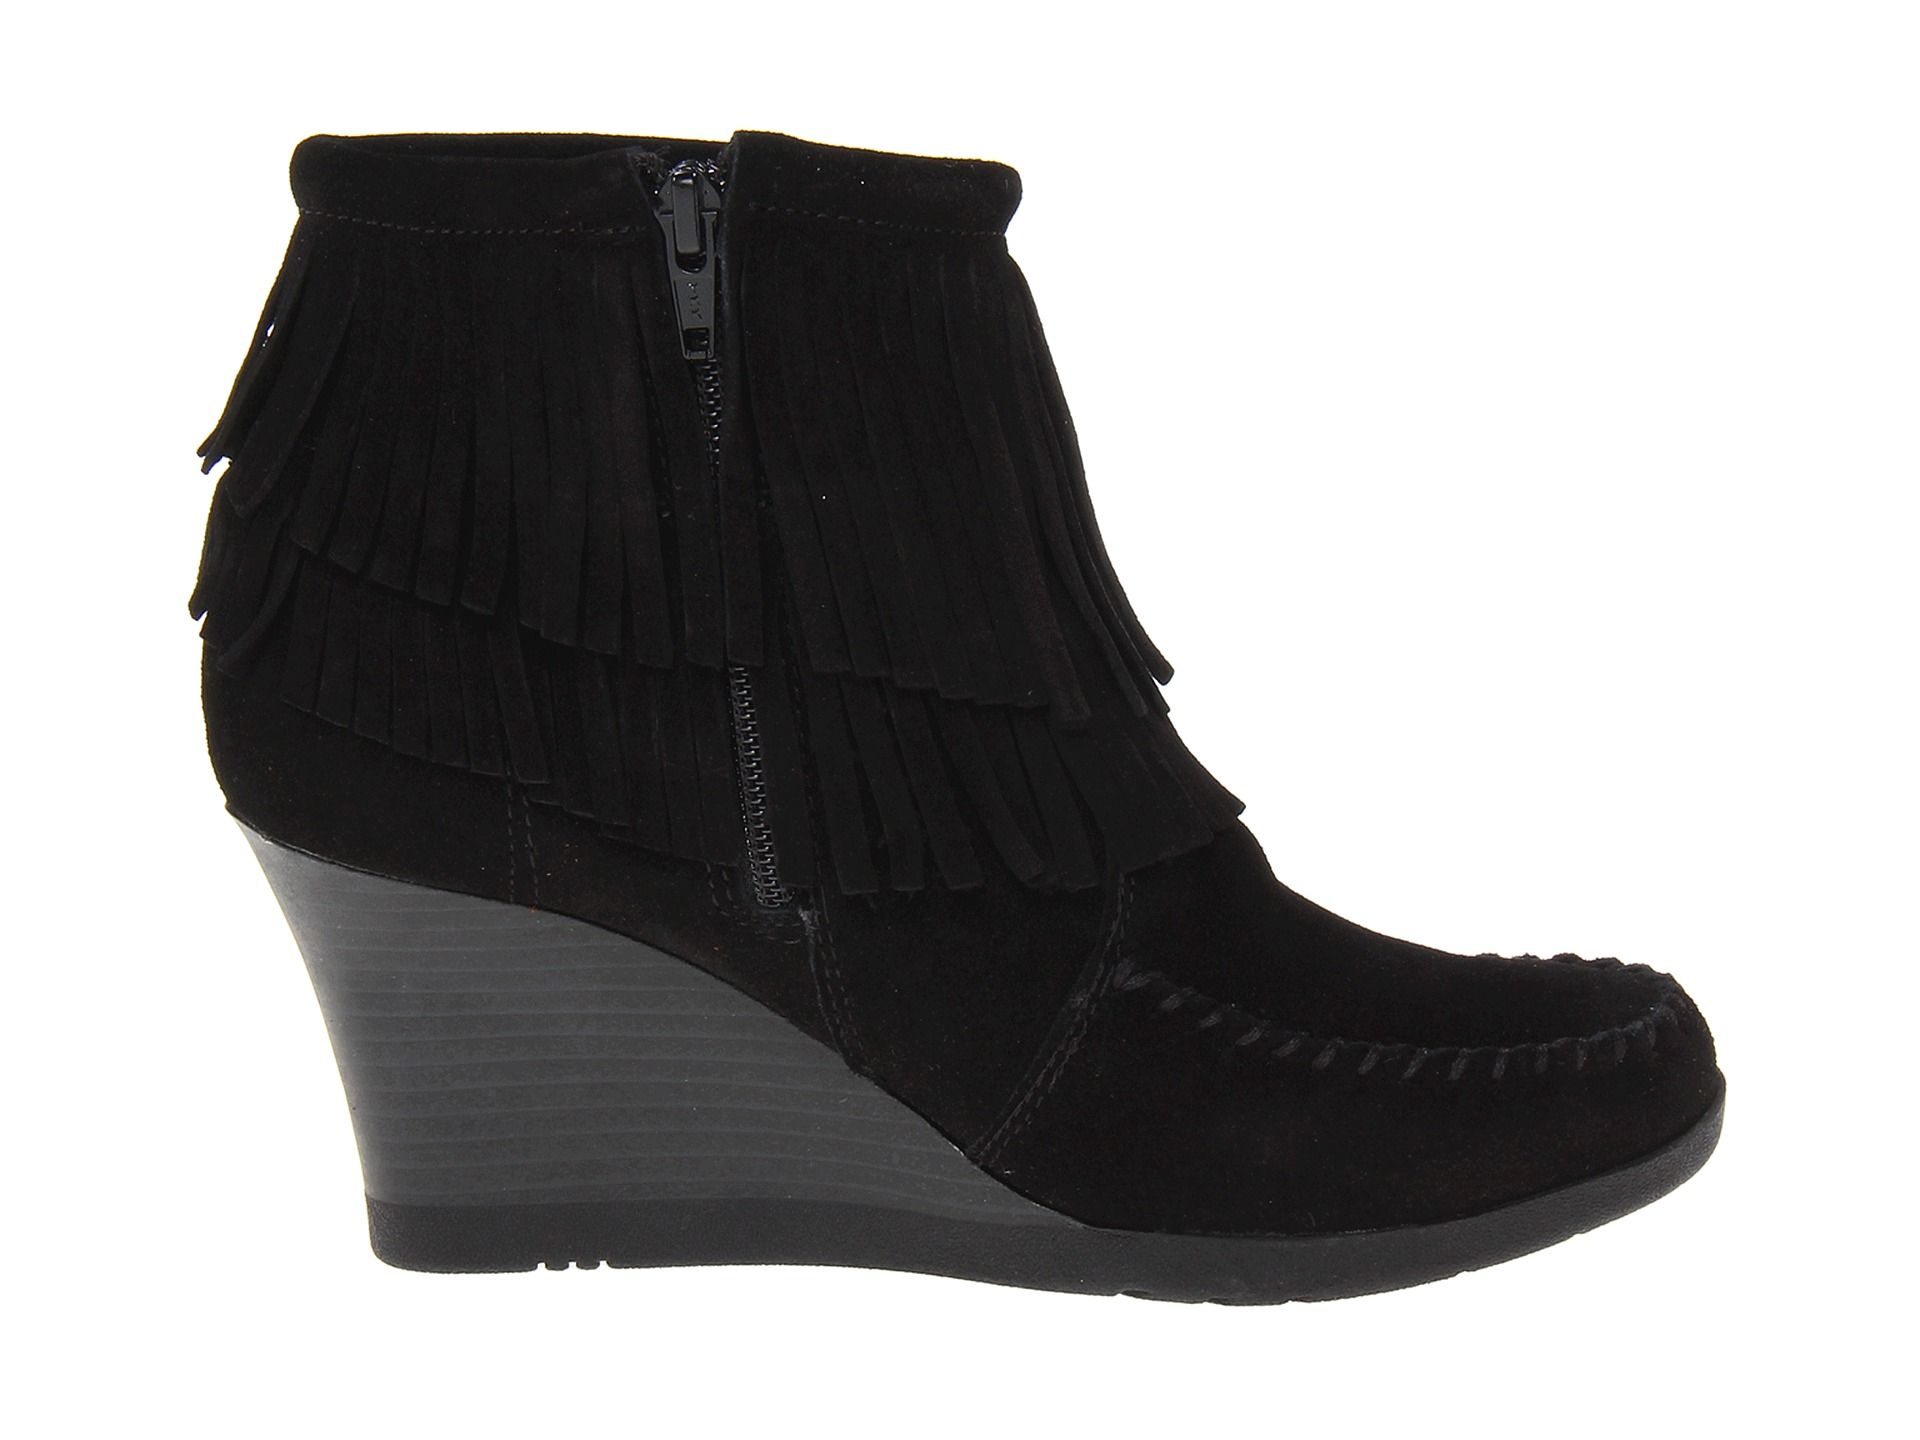 minnetonka fringe ankle wedge boot black suede